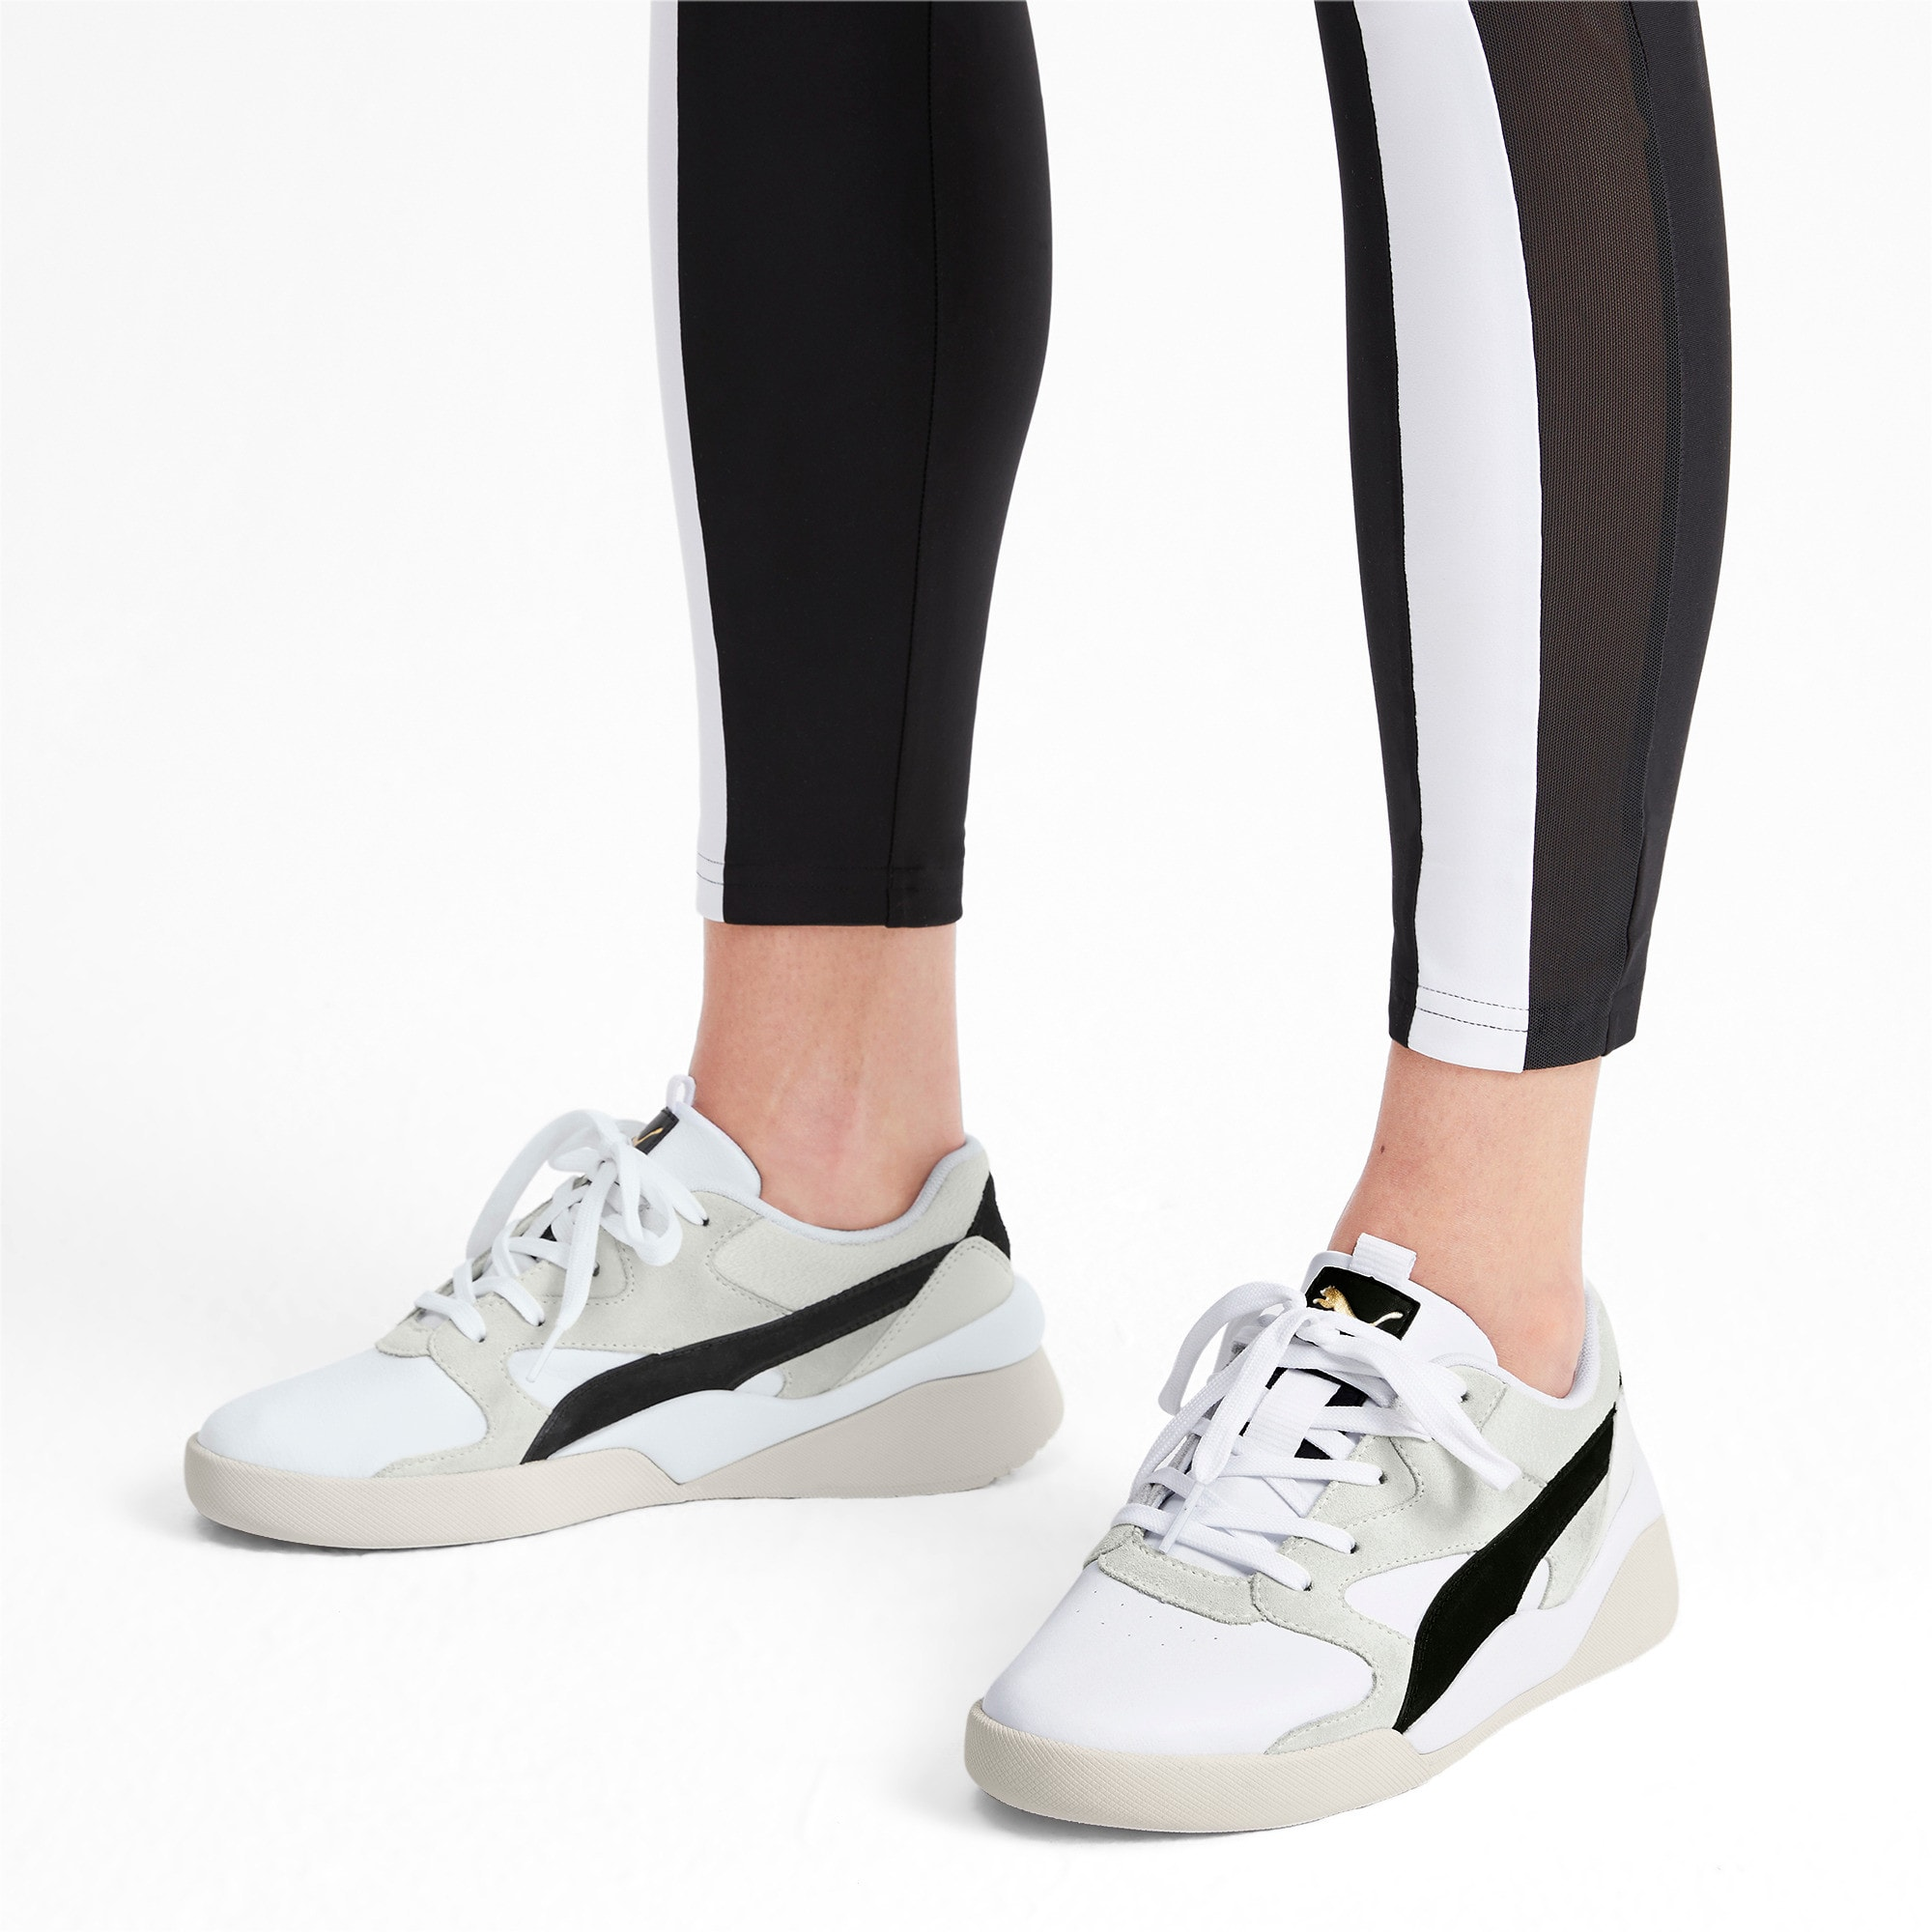 Thumbnail 2 of Aeon Heritage Women's Sneakers, Puma White-Puma Black, medium